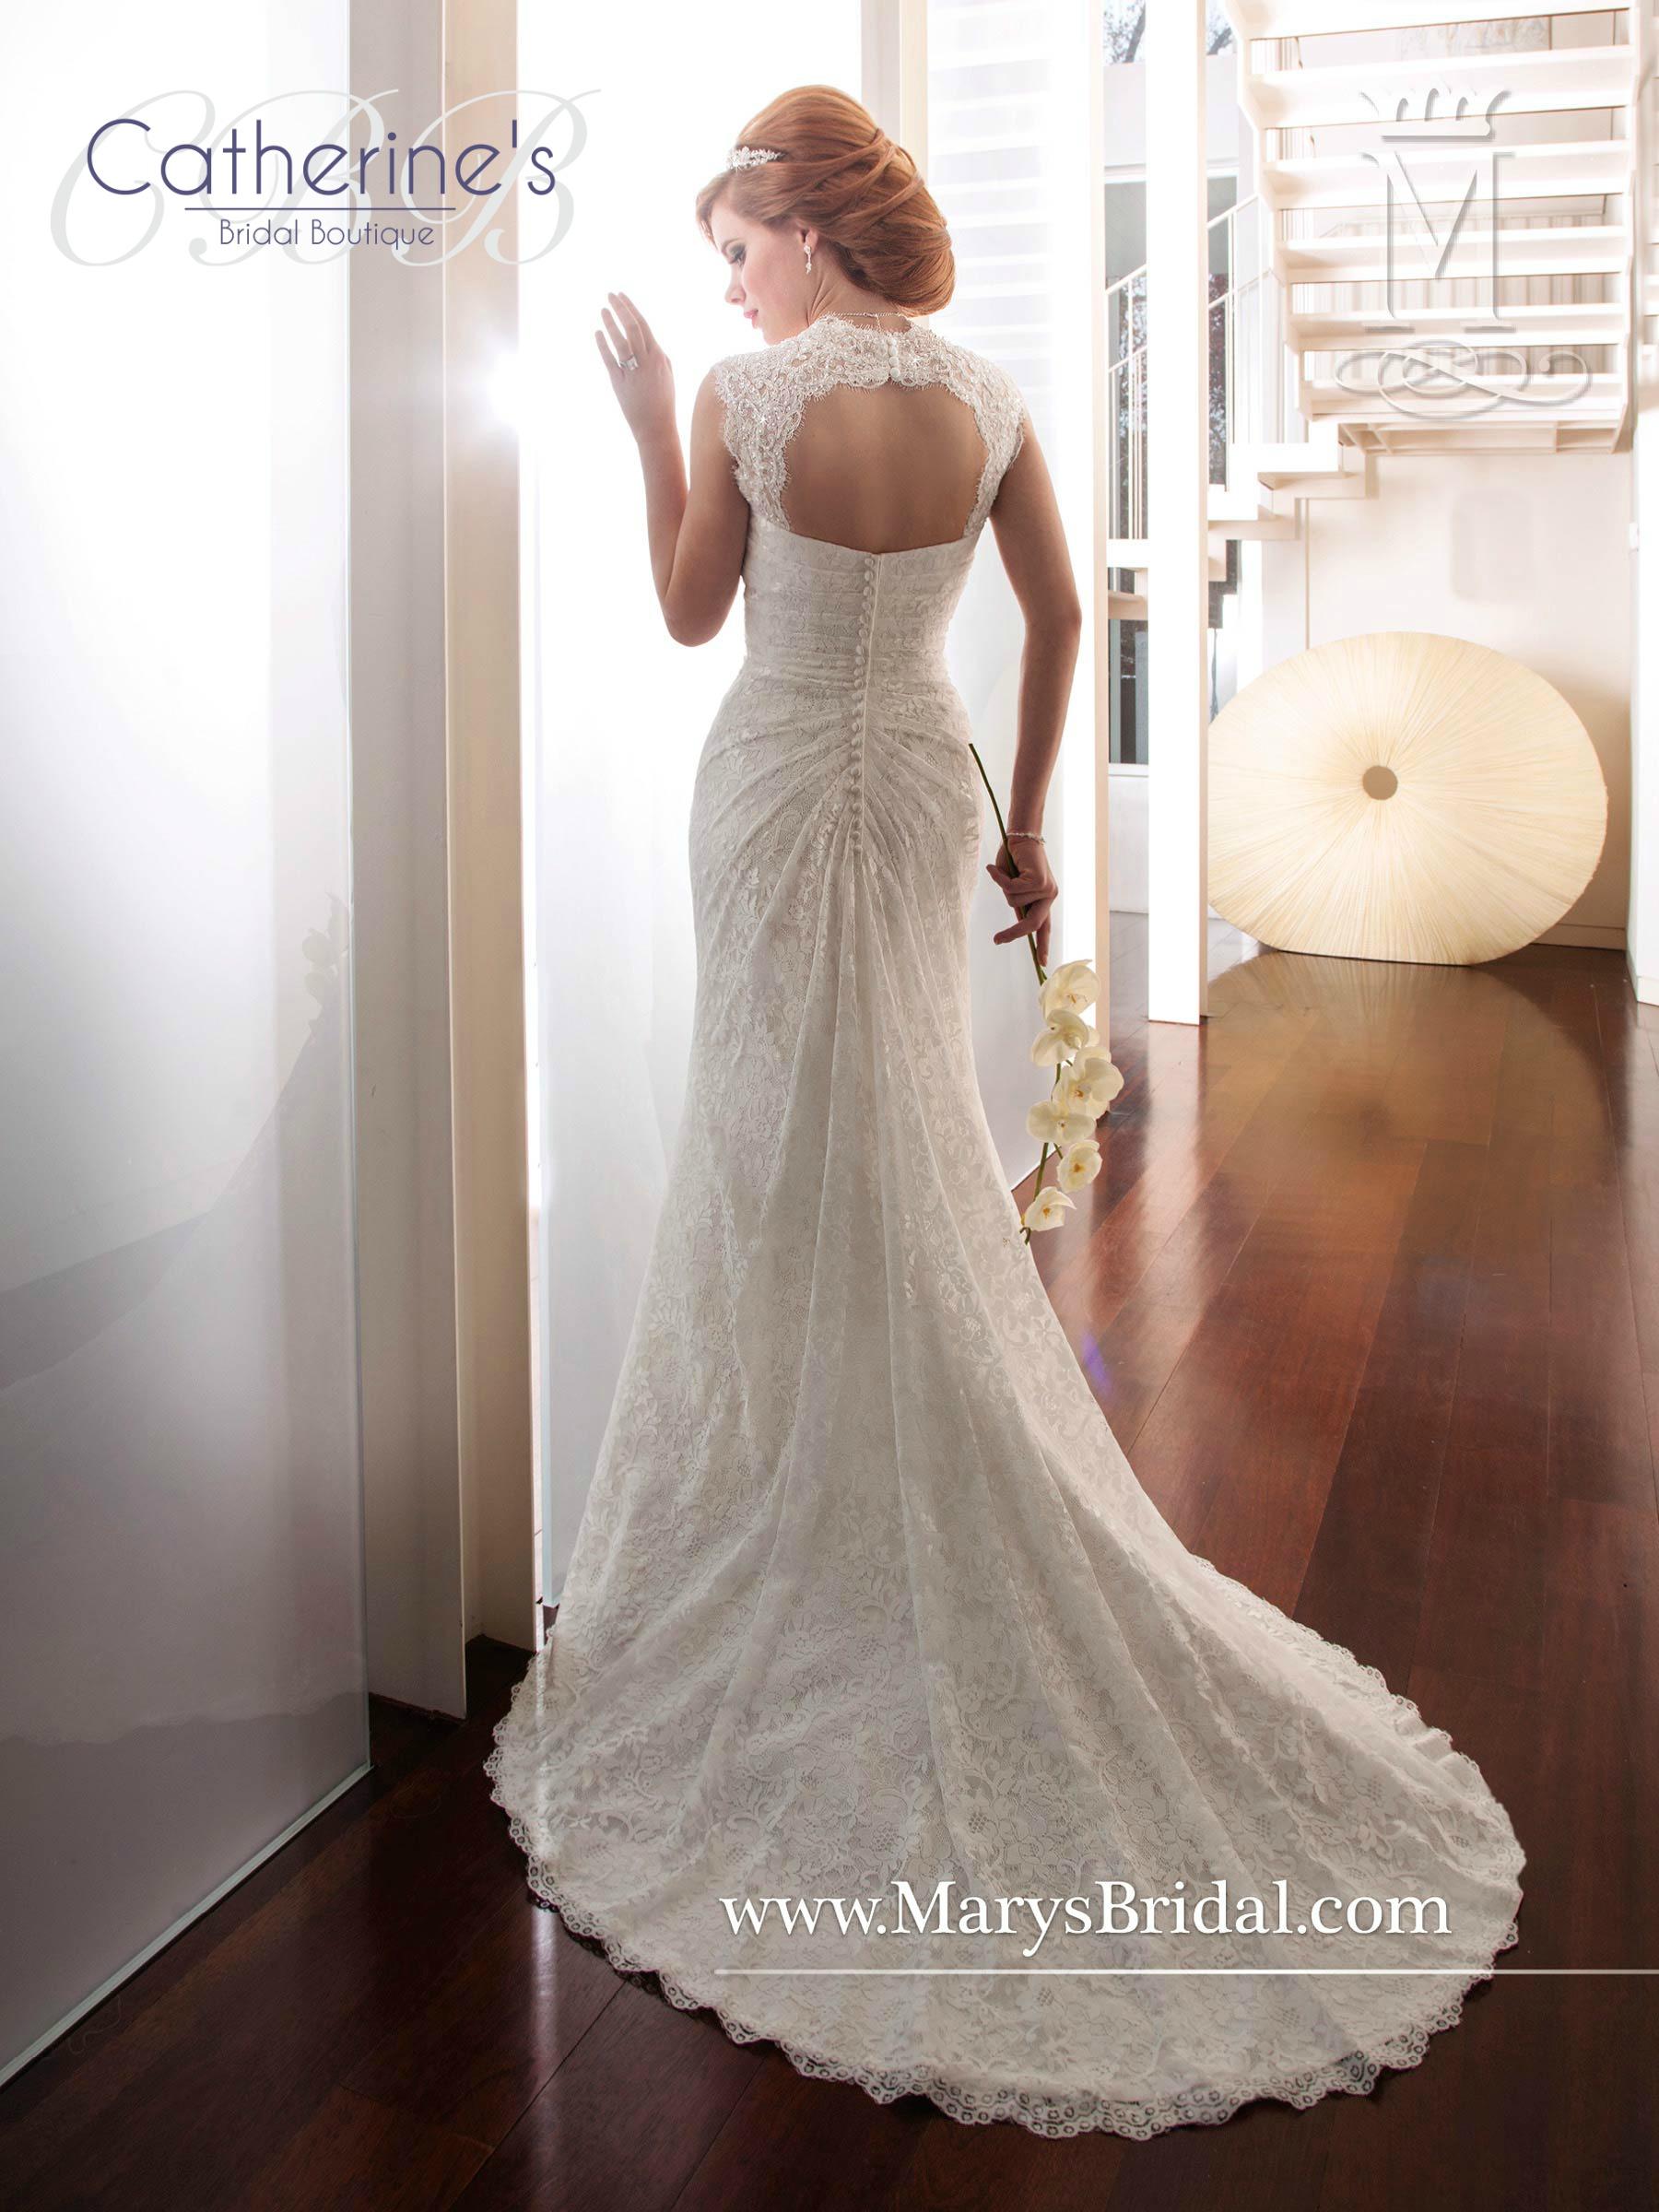 Mary's Bridal style #6250